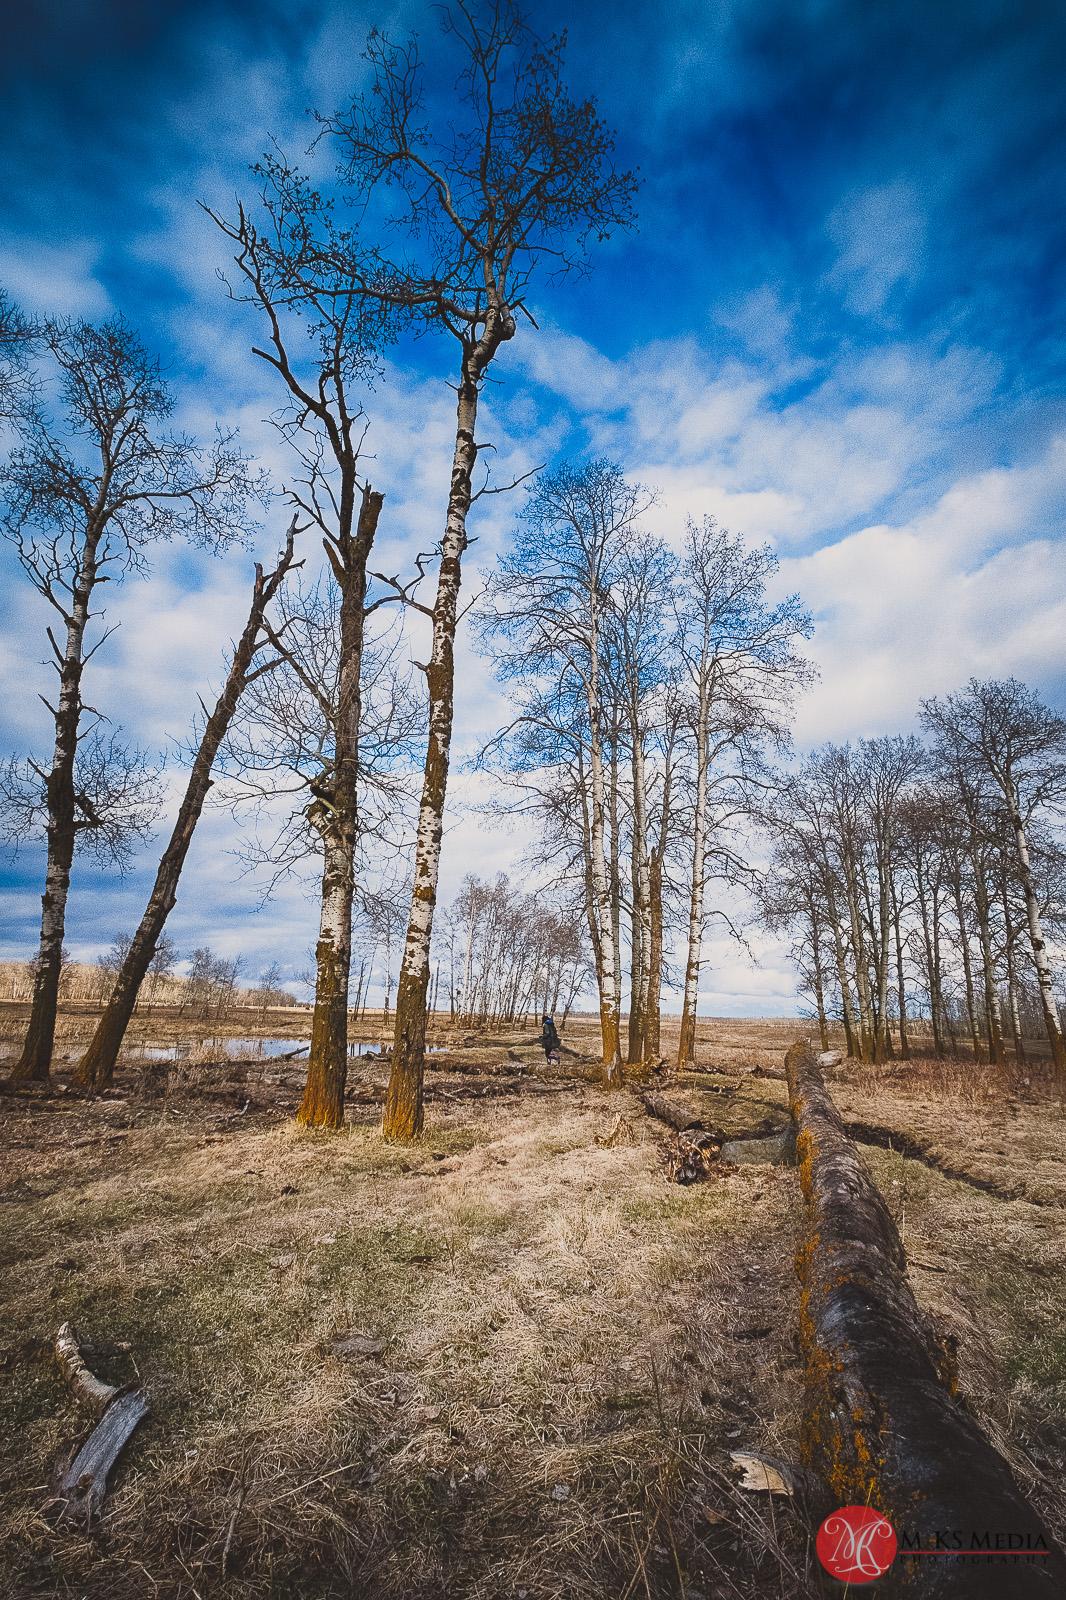 fuji,landscape,10-24,wide,alberta,outdoors,